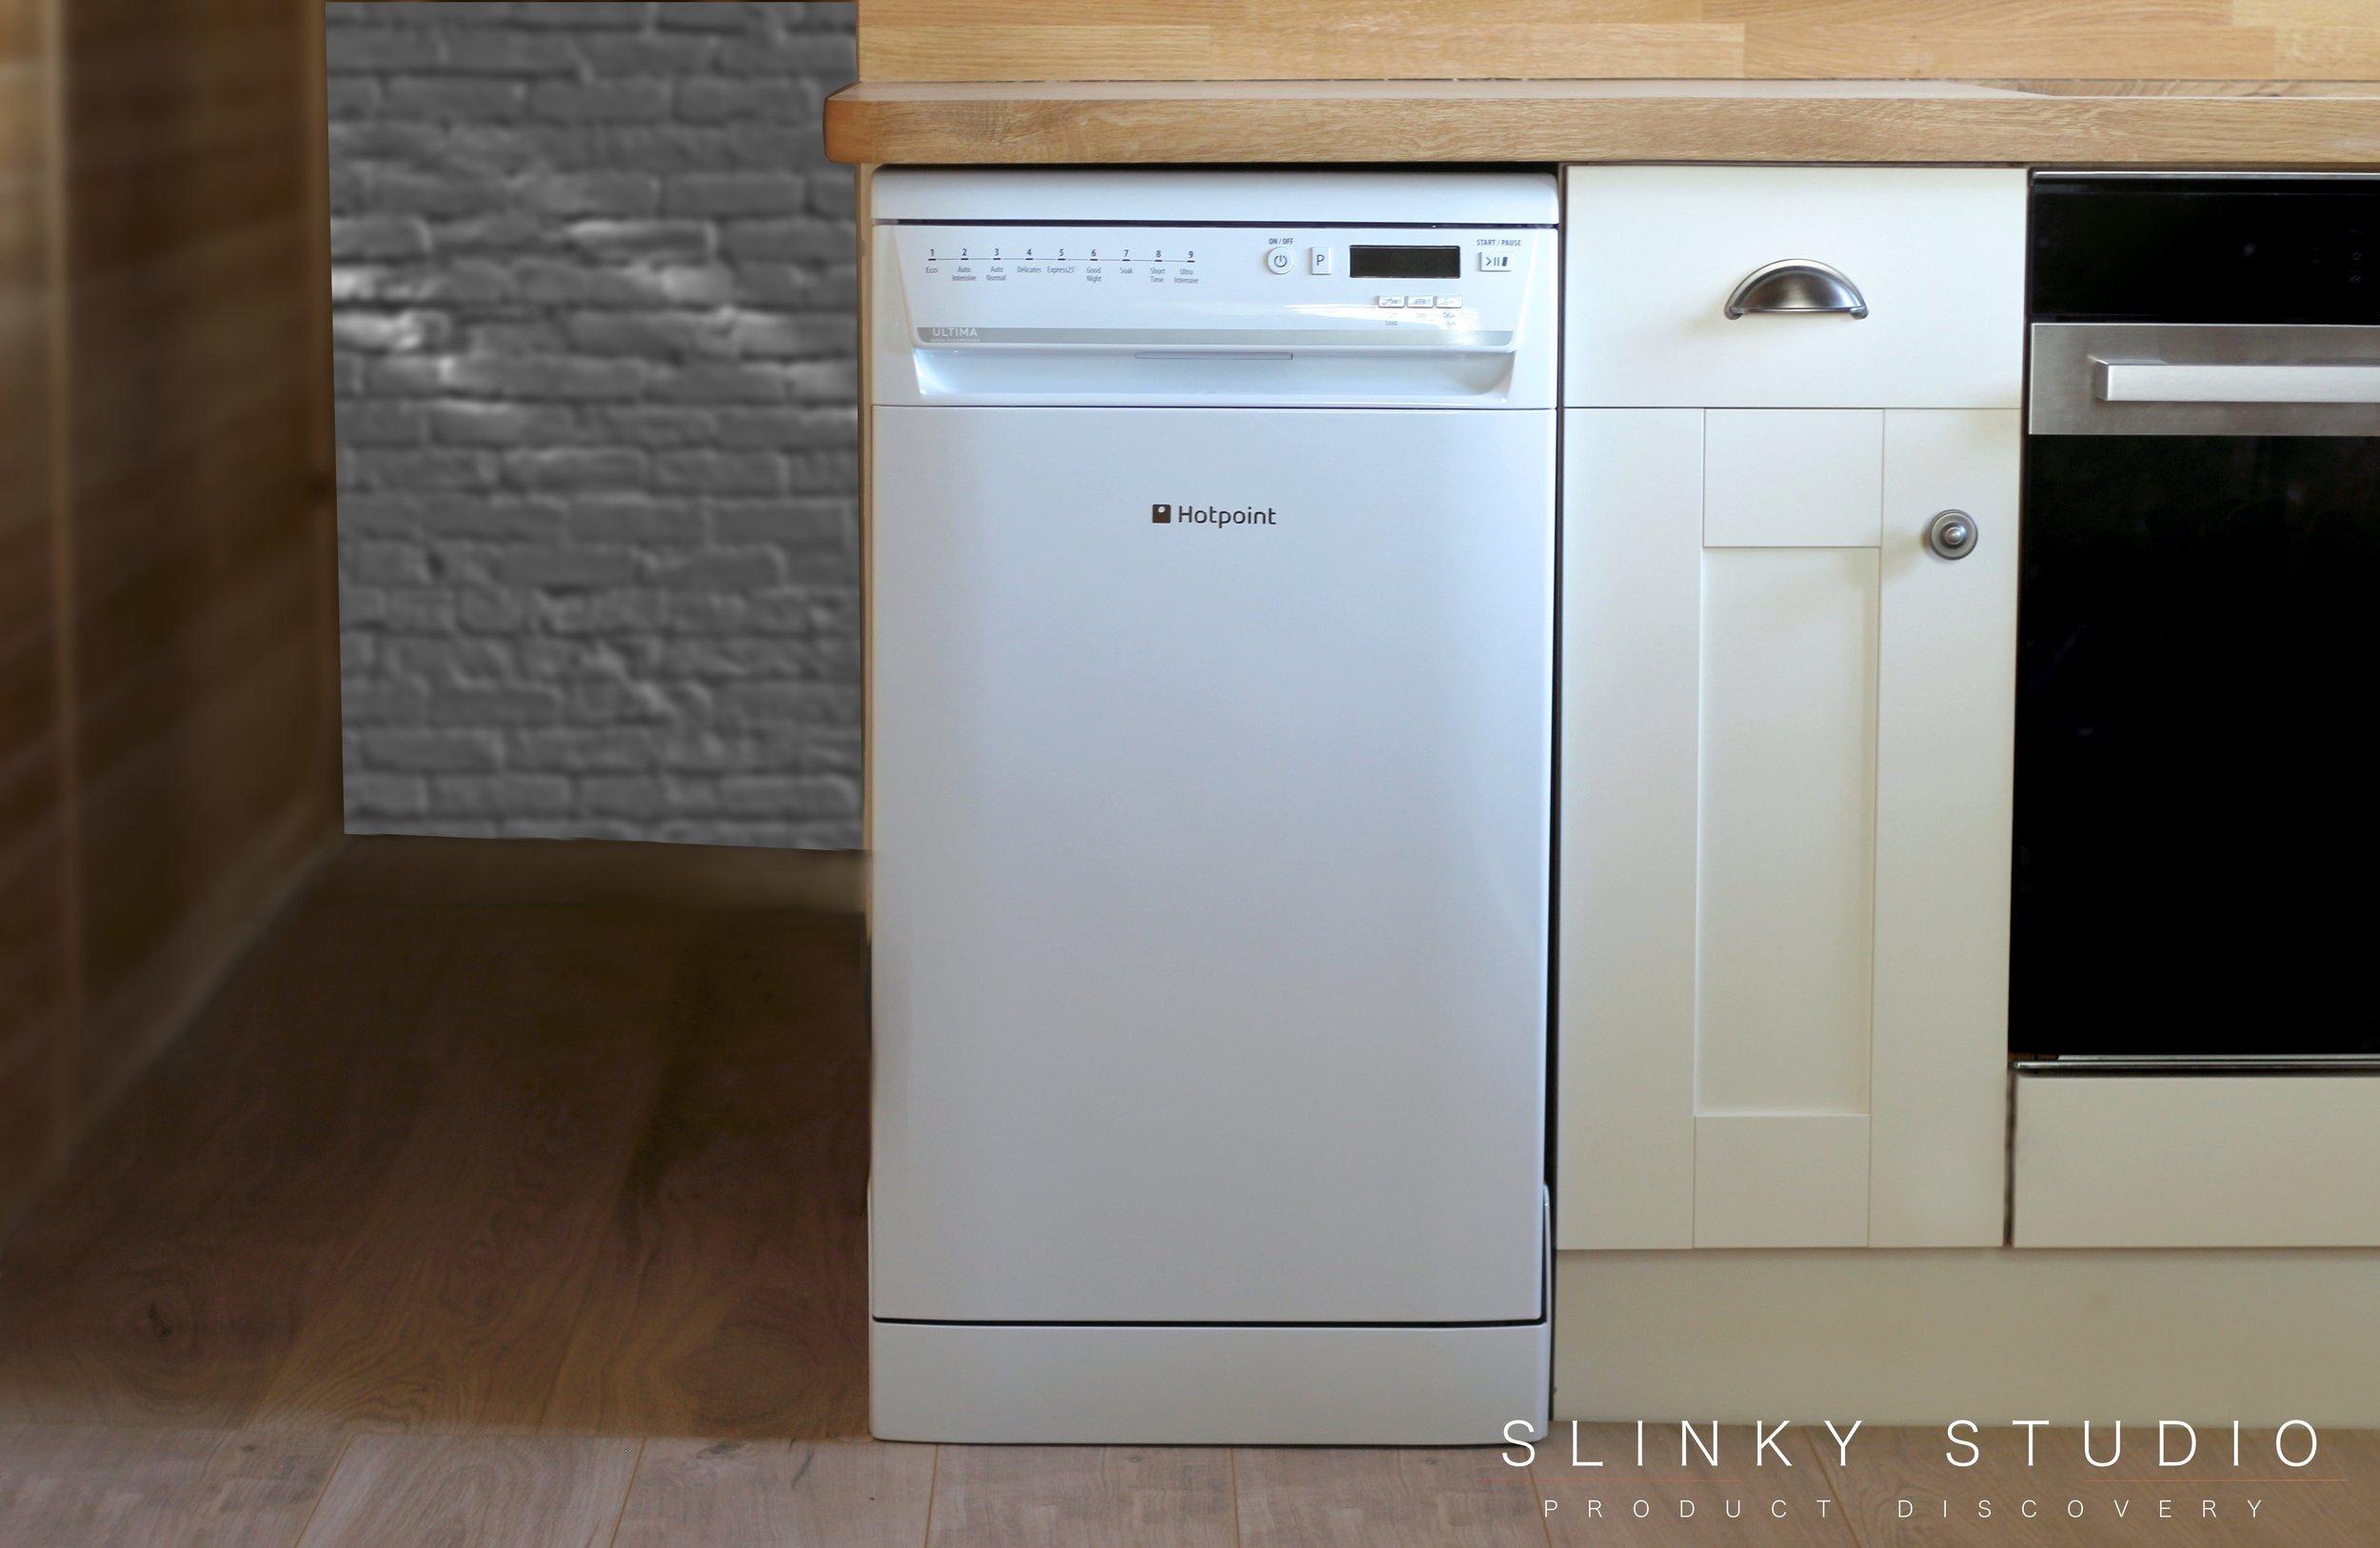 Hotpoint Ultima Slimline Dishwasher White Full View.jpg